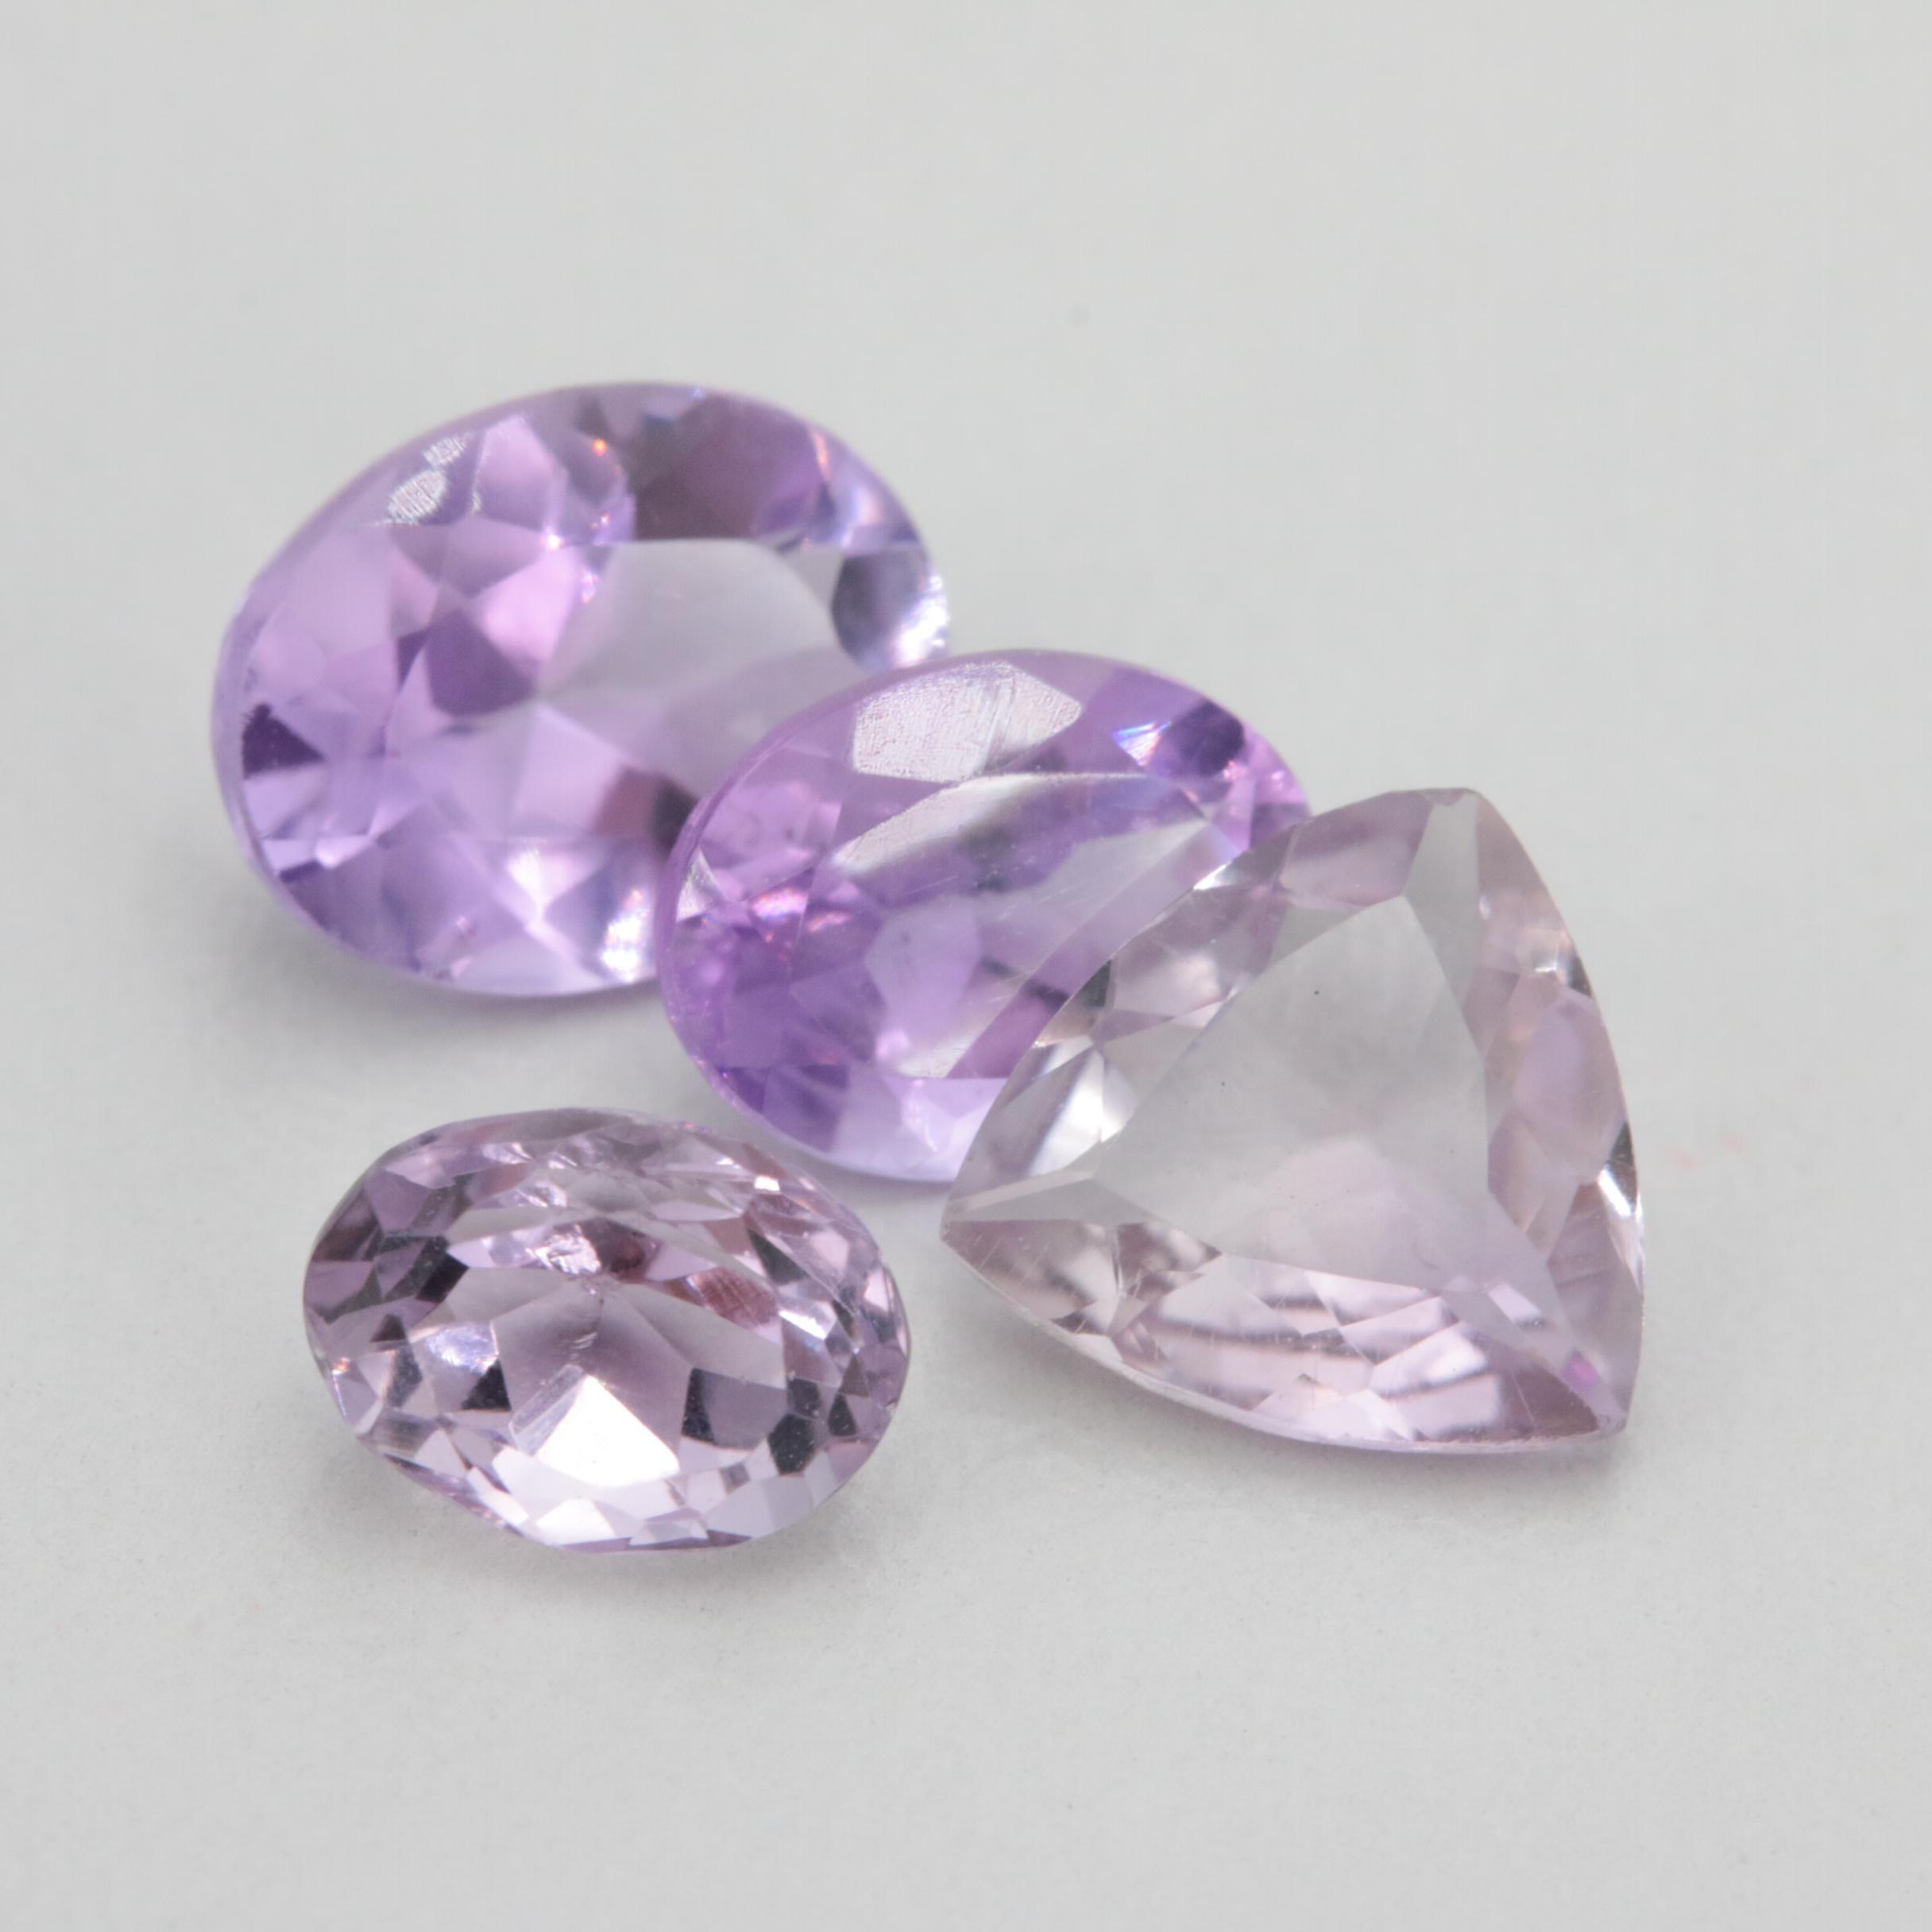 Loose 4.76 CTW Amethyst Gemstones